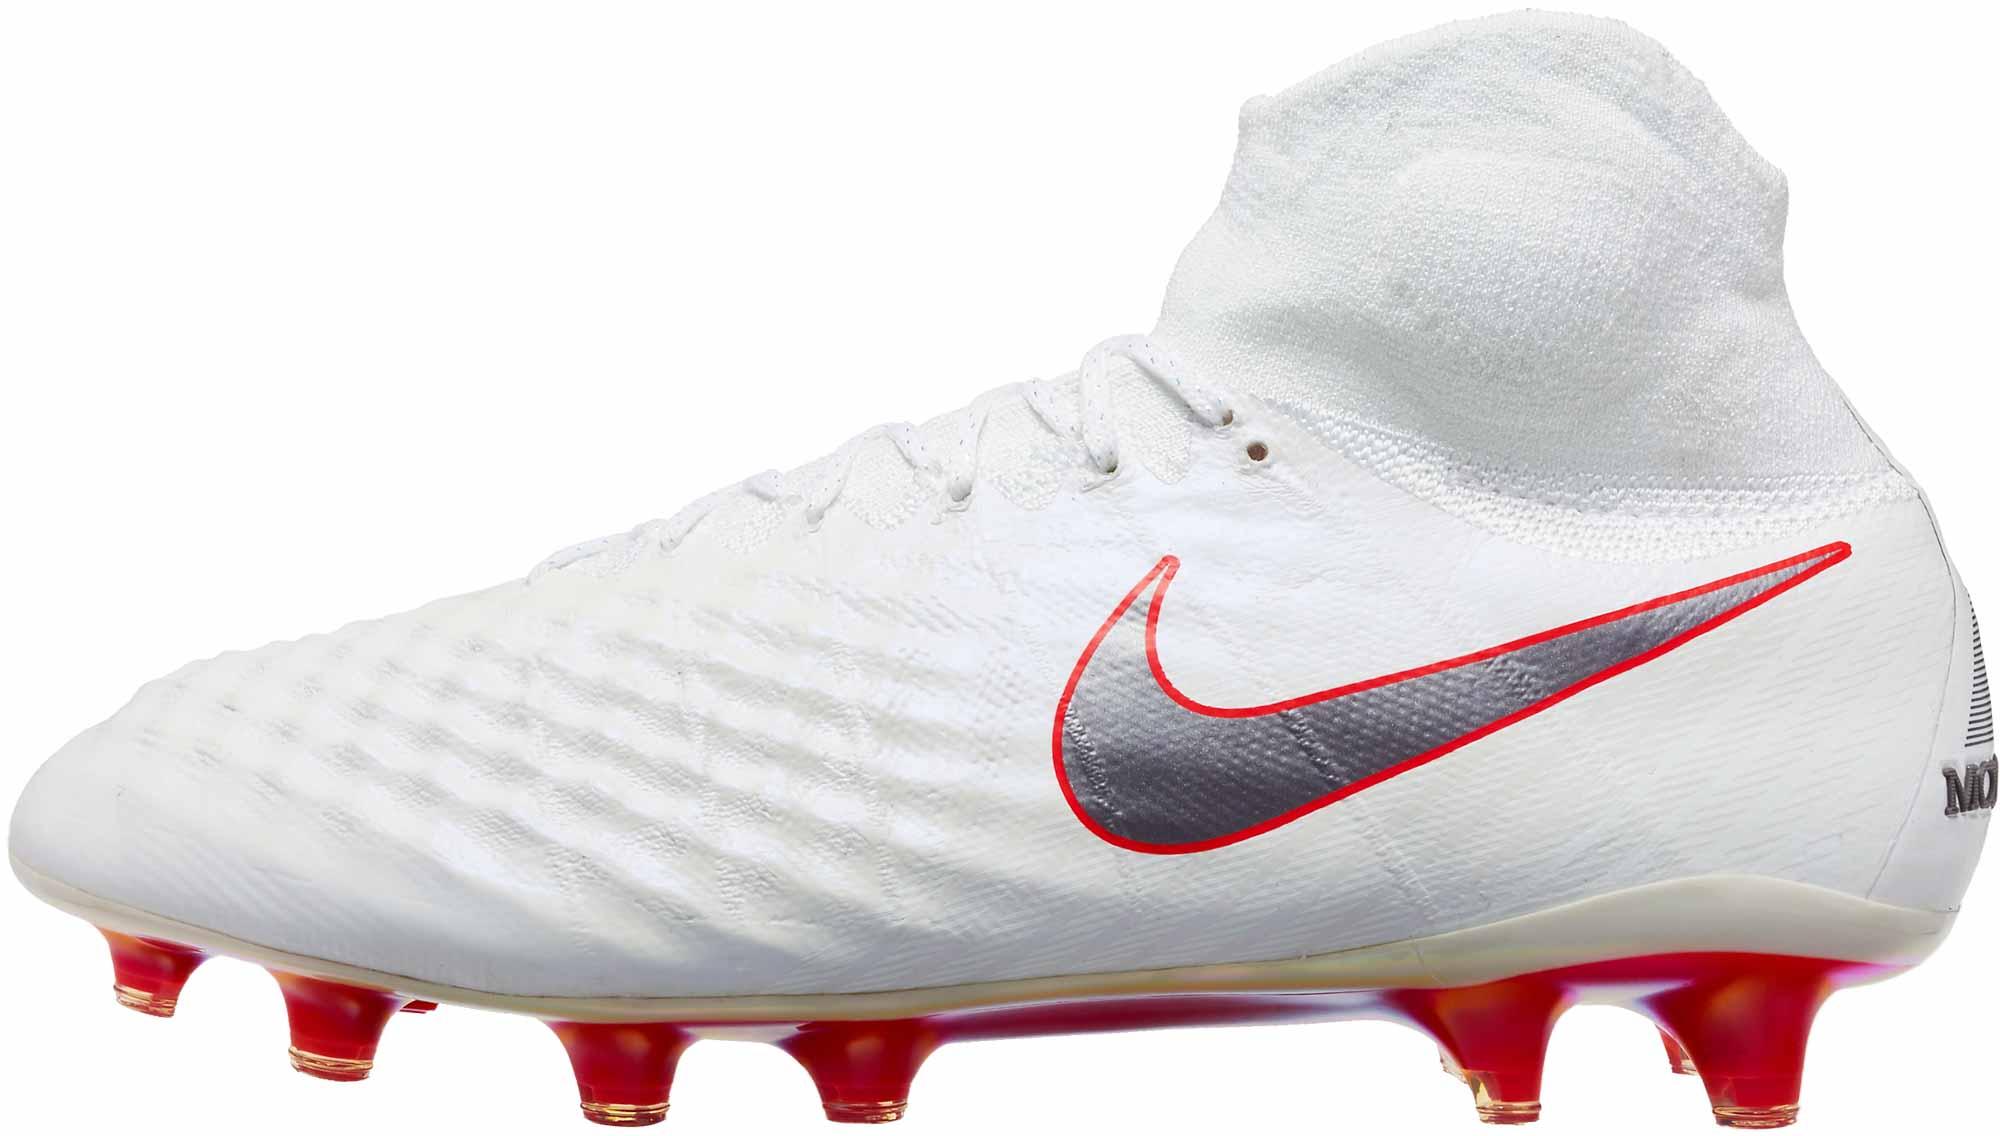 4df72eb651f1 Home   Shop By Brand   Nike Soccer   Nike Soccer Shoes   Nike Magista Obra  ...